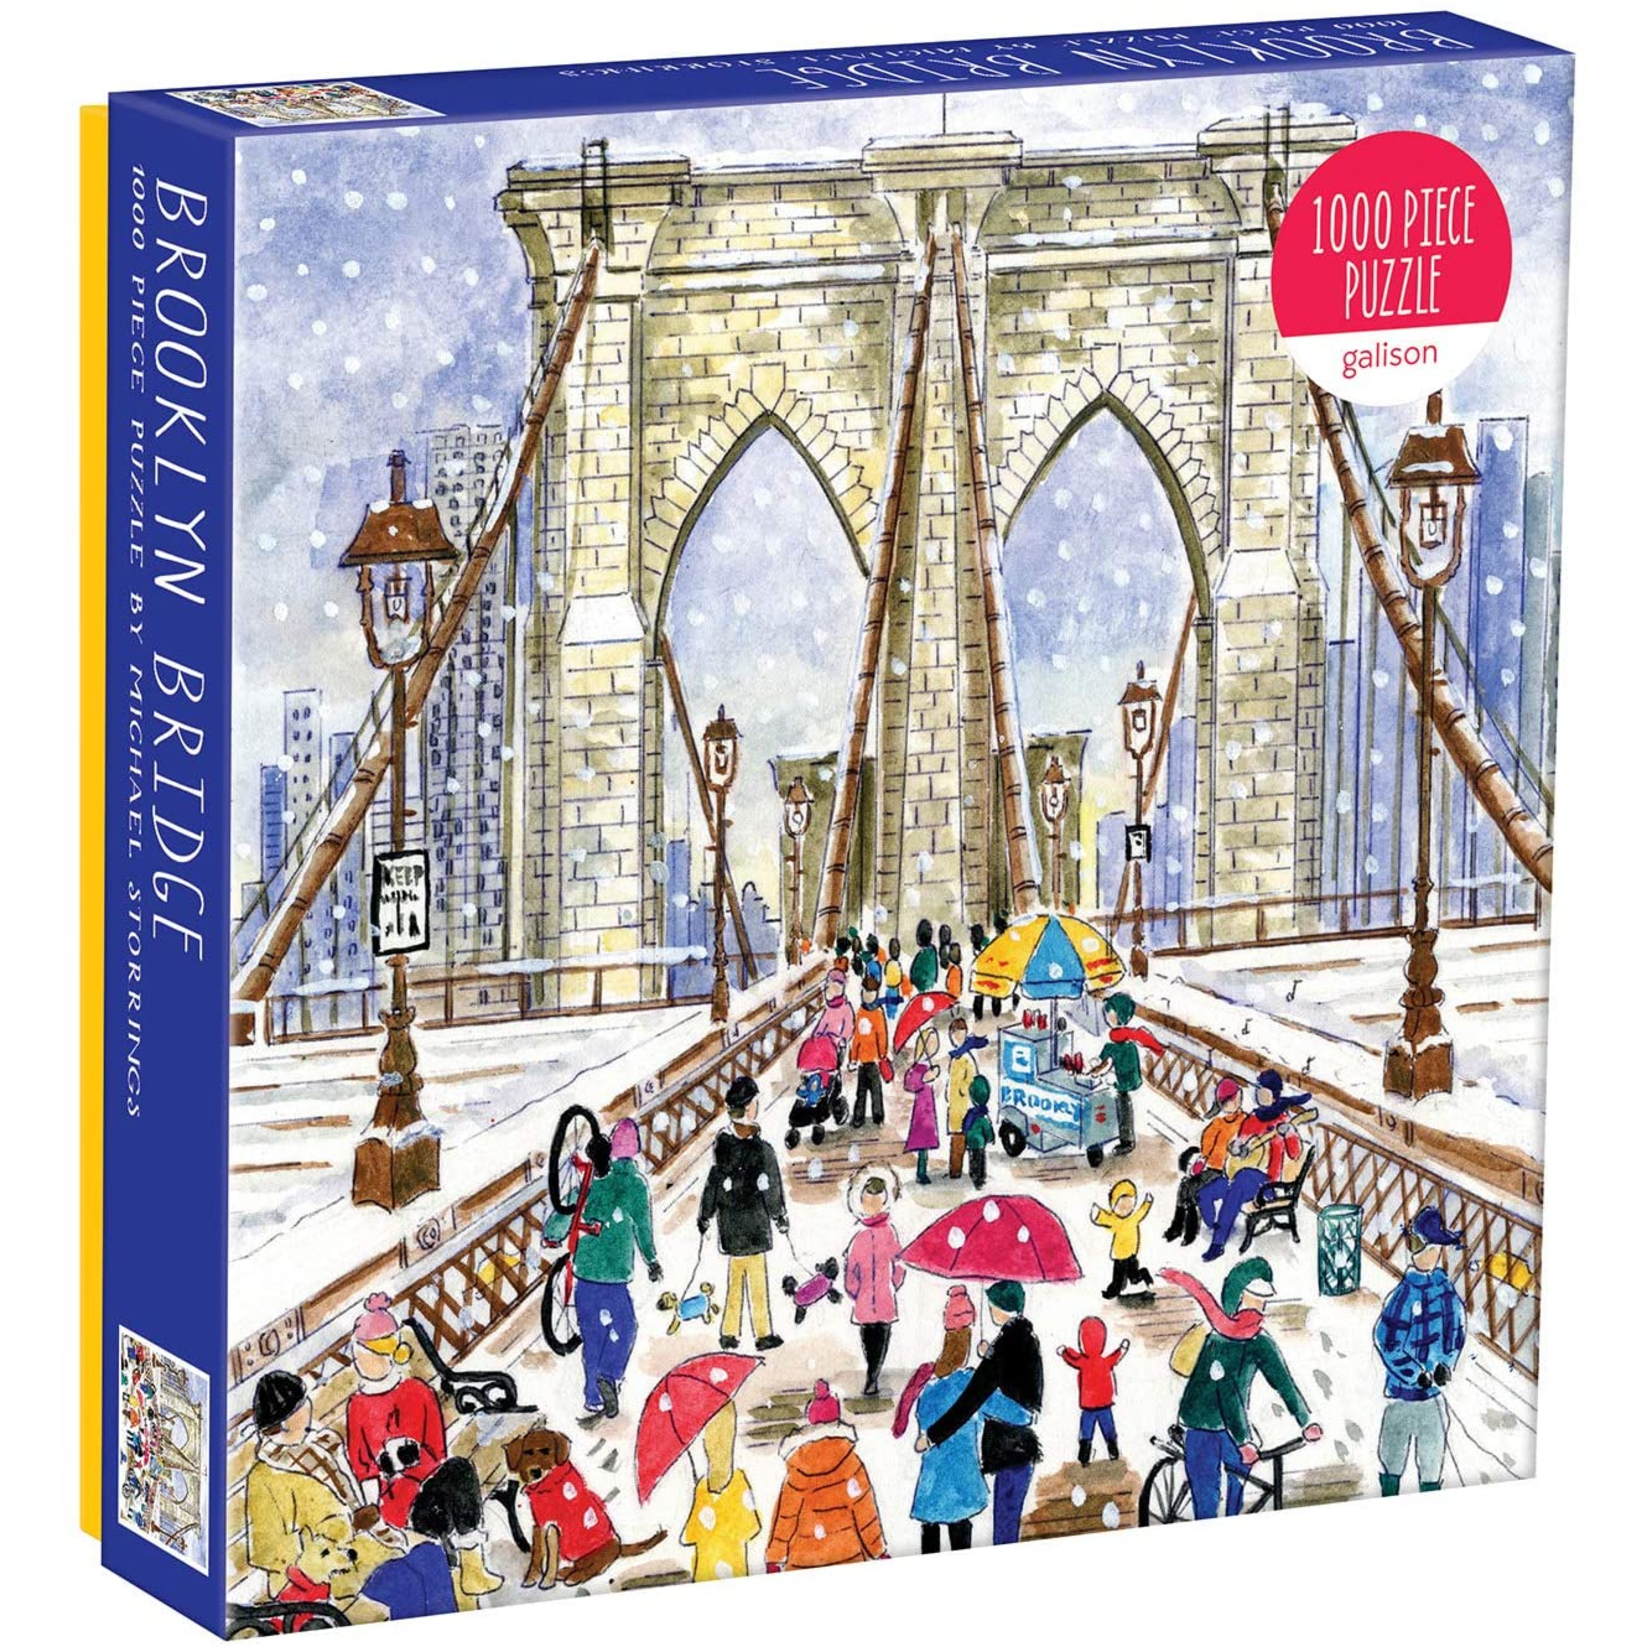 Galison Brooklyn Bridge by Michael Storrings - 1000 Piece Jigsaw Puzzle